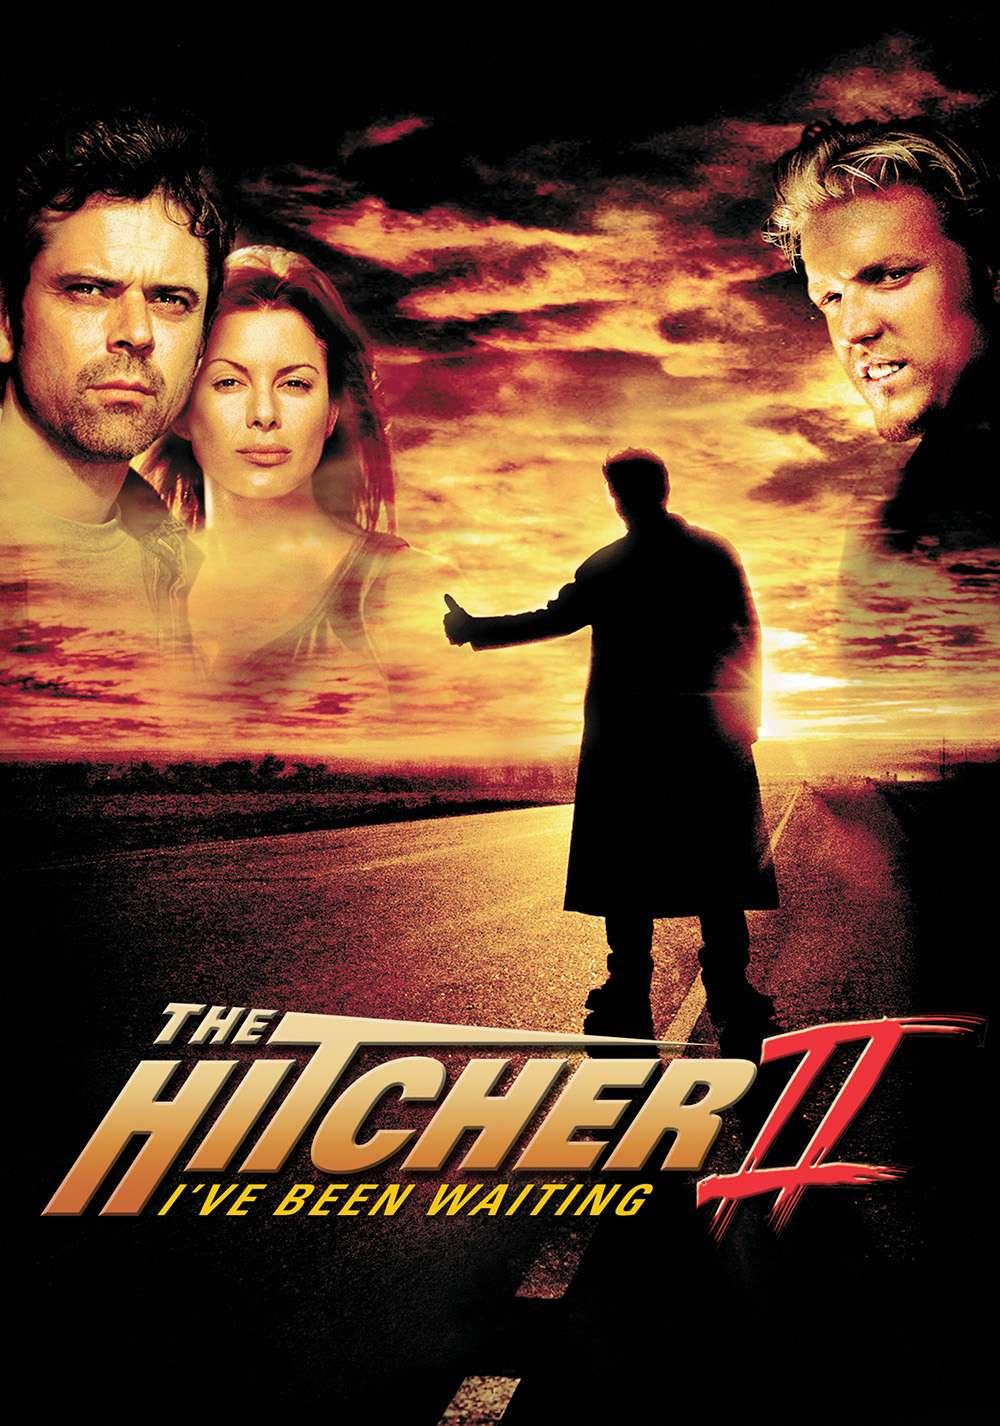 The Hitcher II: I've Been Waiting kapak